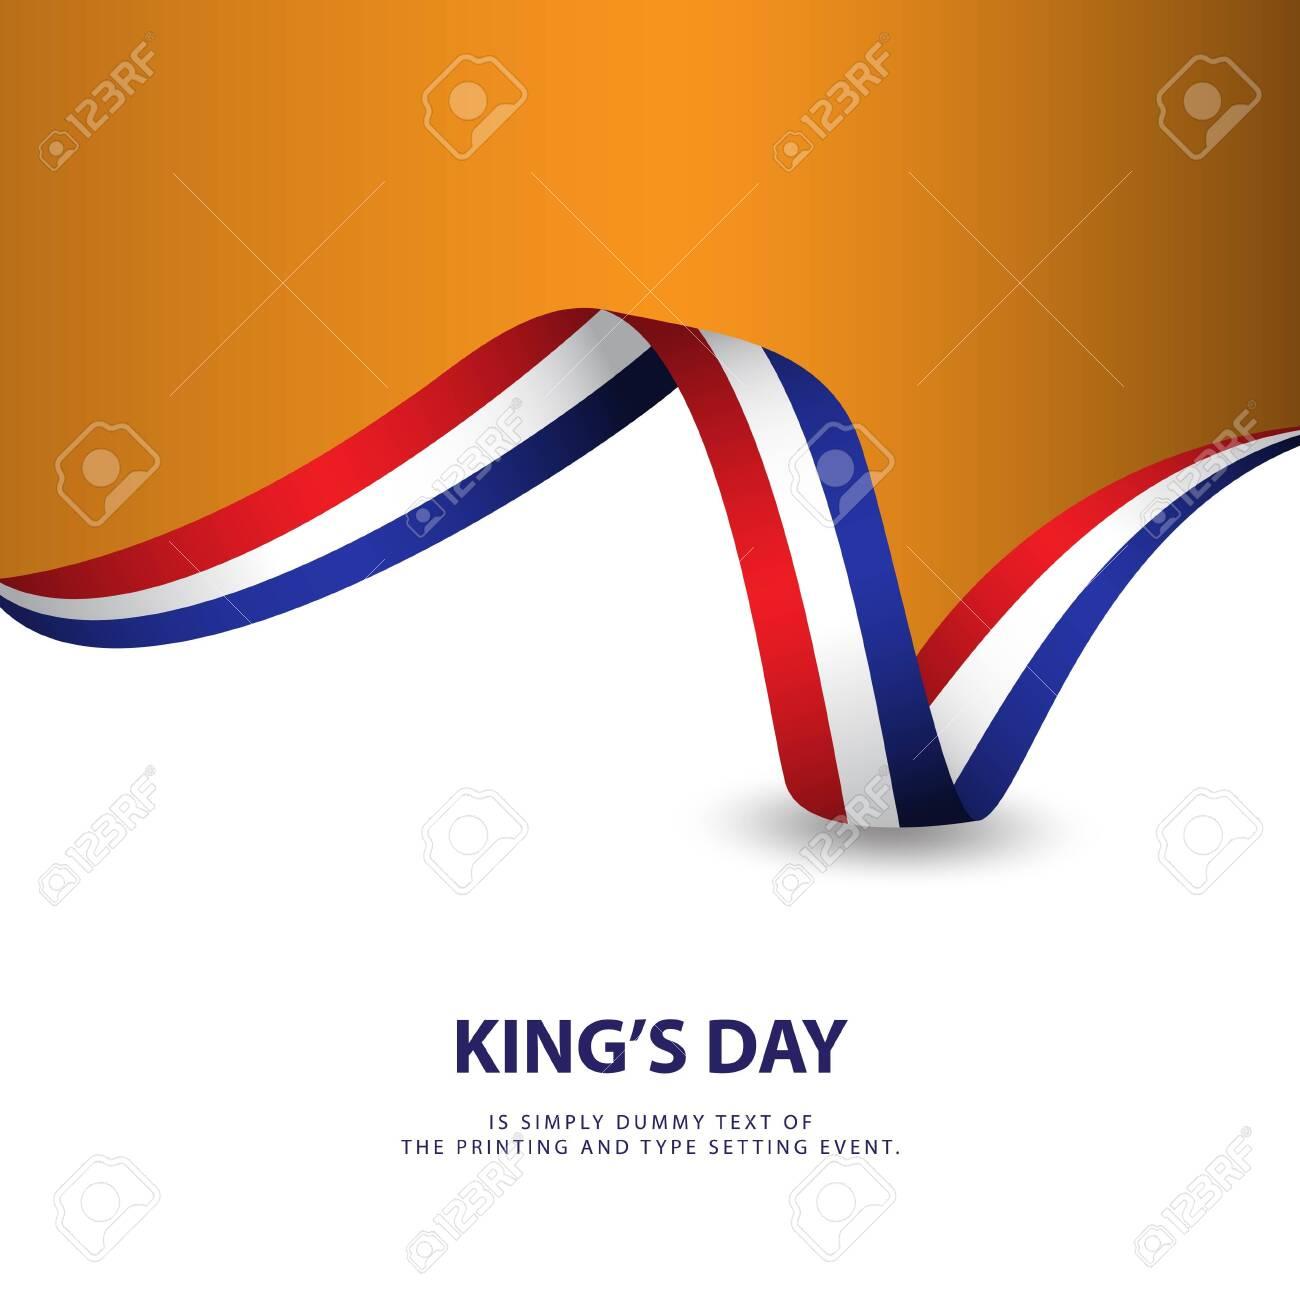 King's Day Vector Template Design Illustration - 124329807